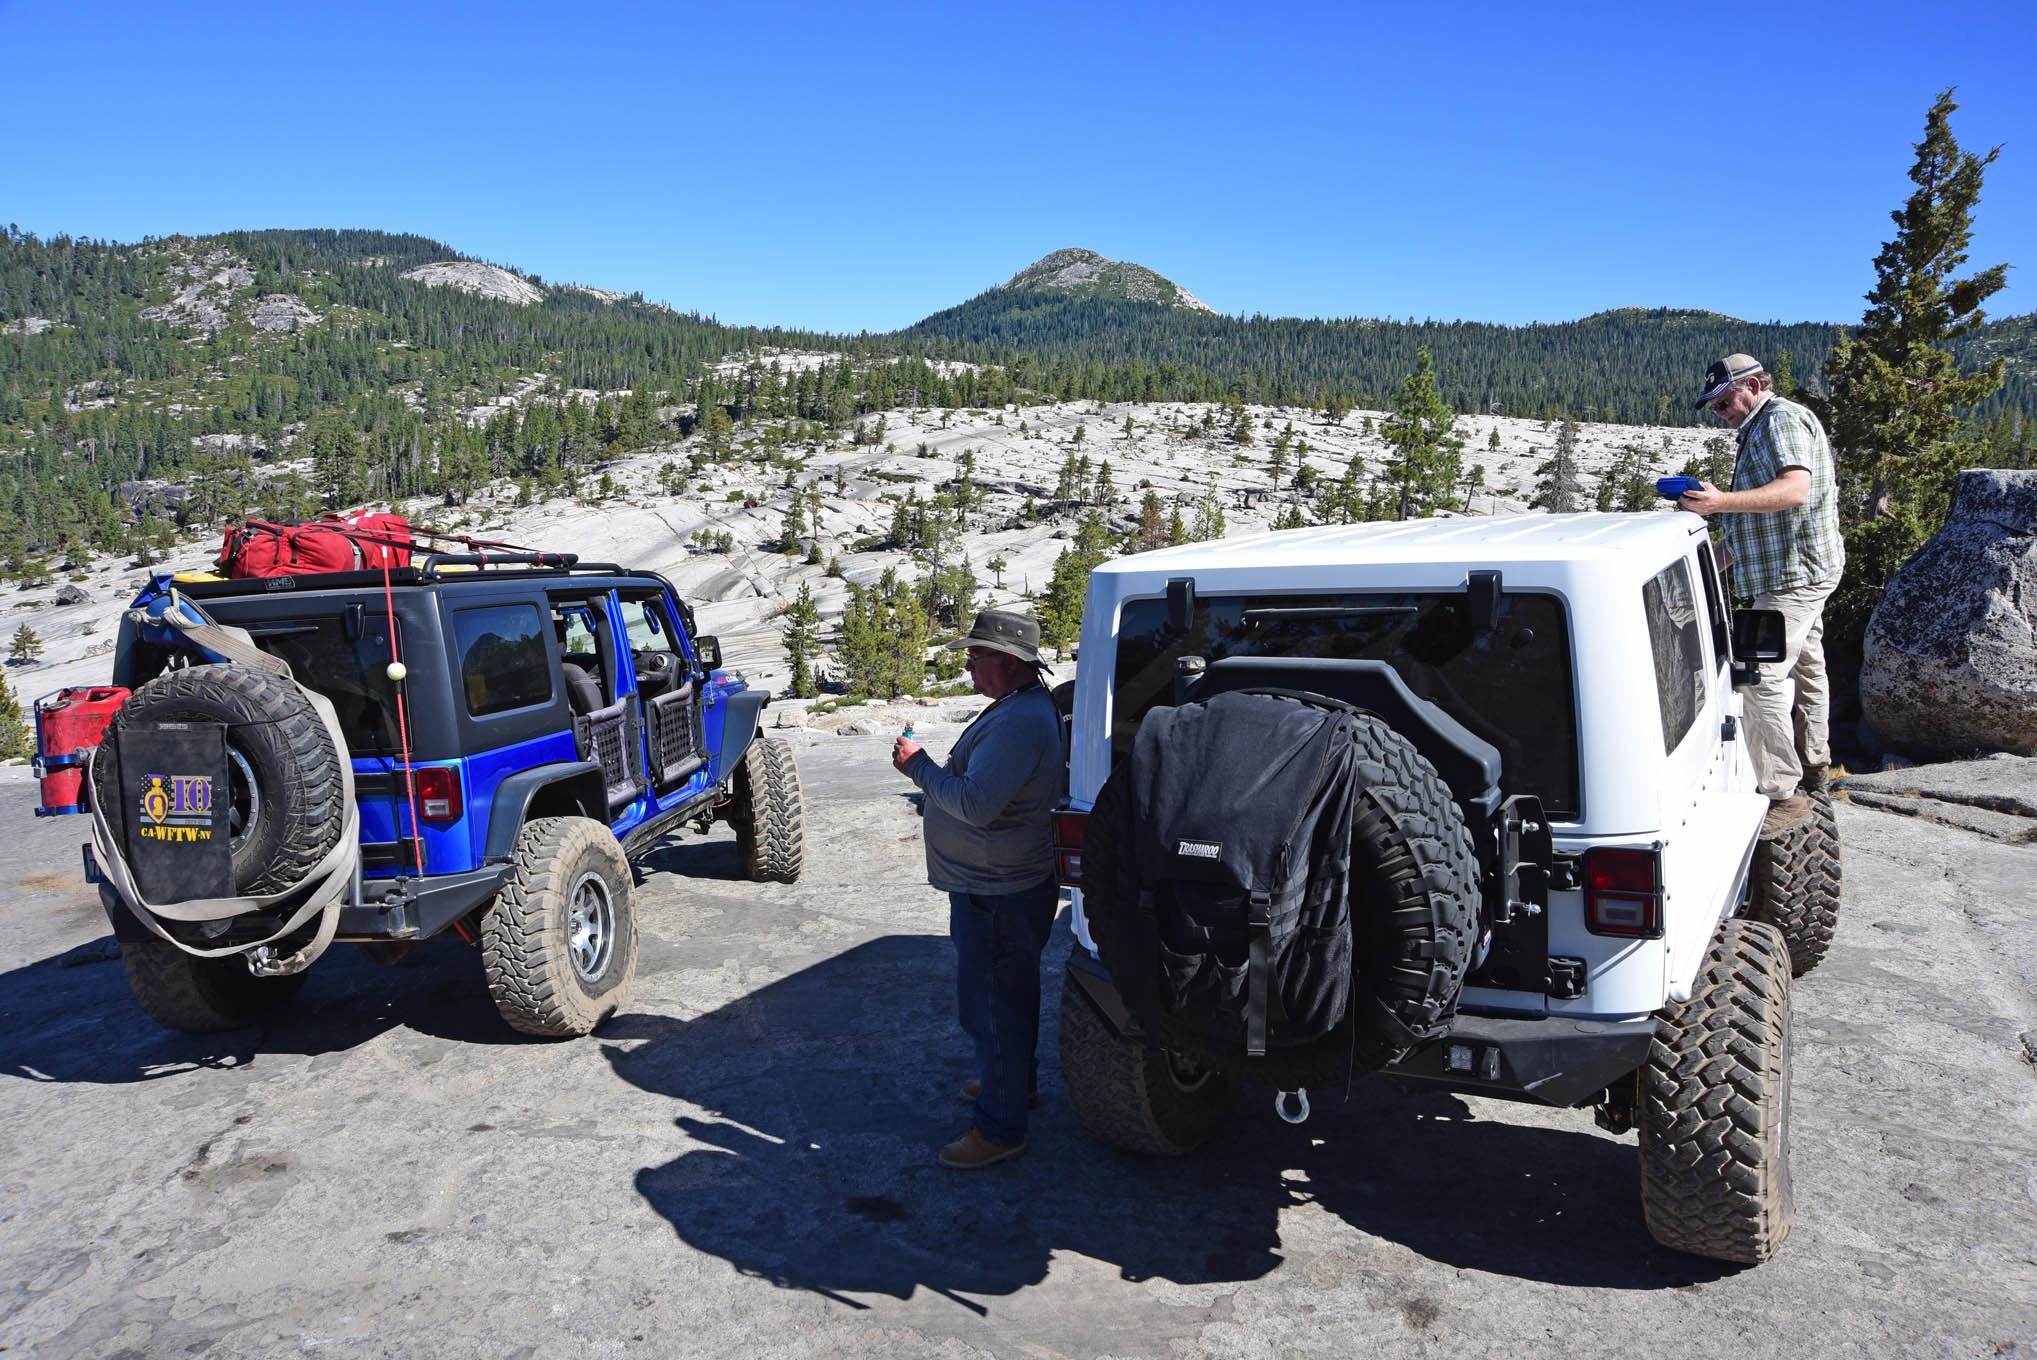 027 rubicon trail modern jeeper adventures metal cloak 2019 stuart bourdon